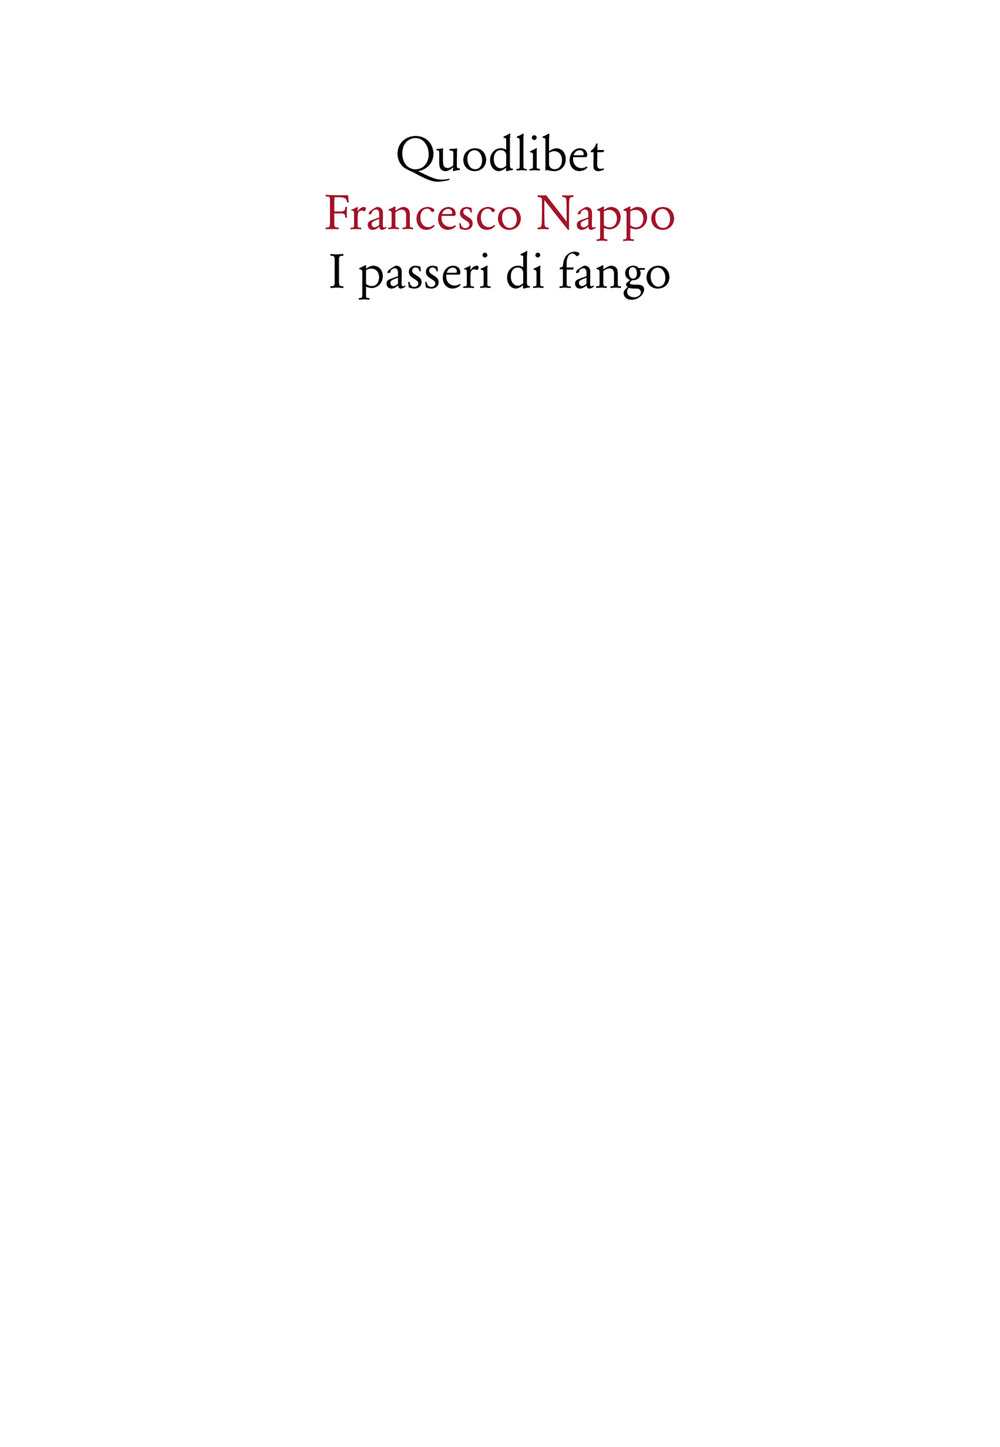 PASSERI DI FANGO (I) - 9788822901224